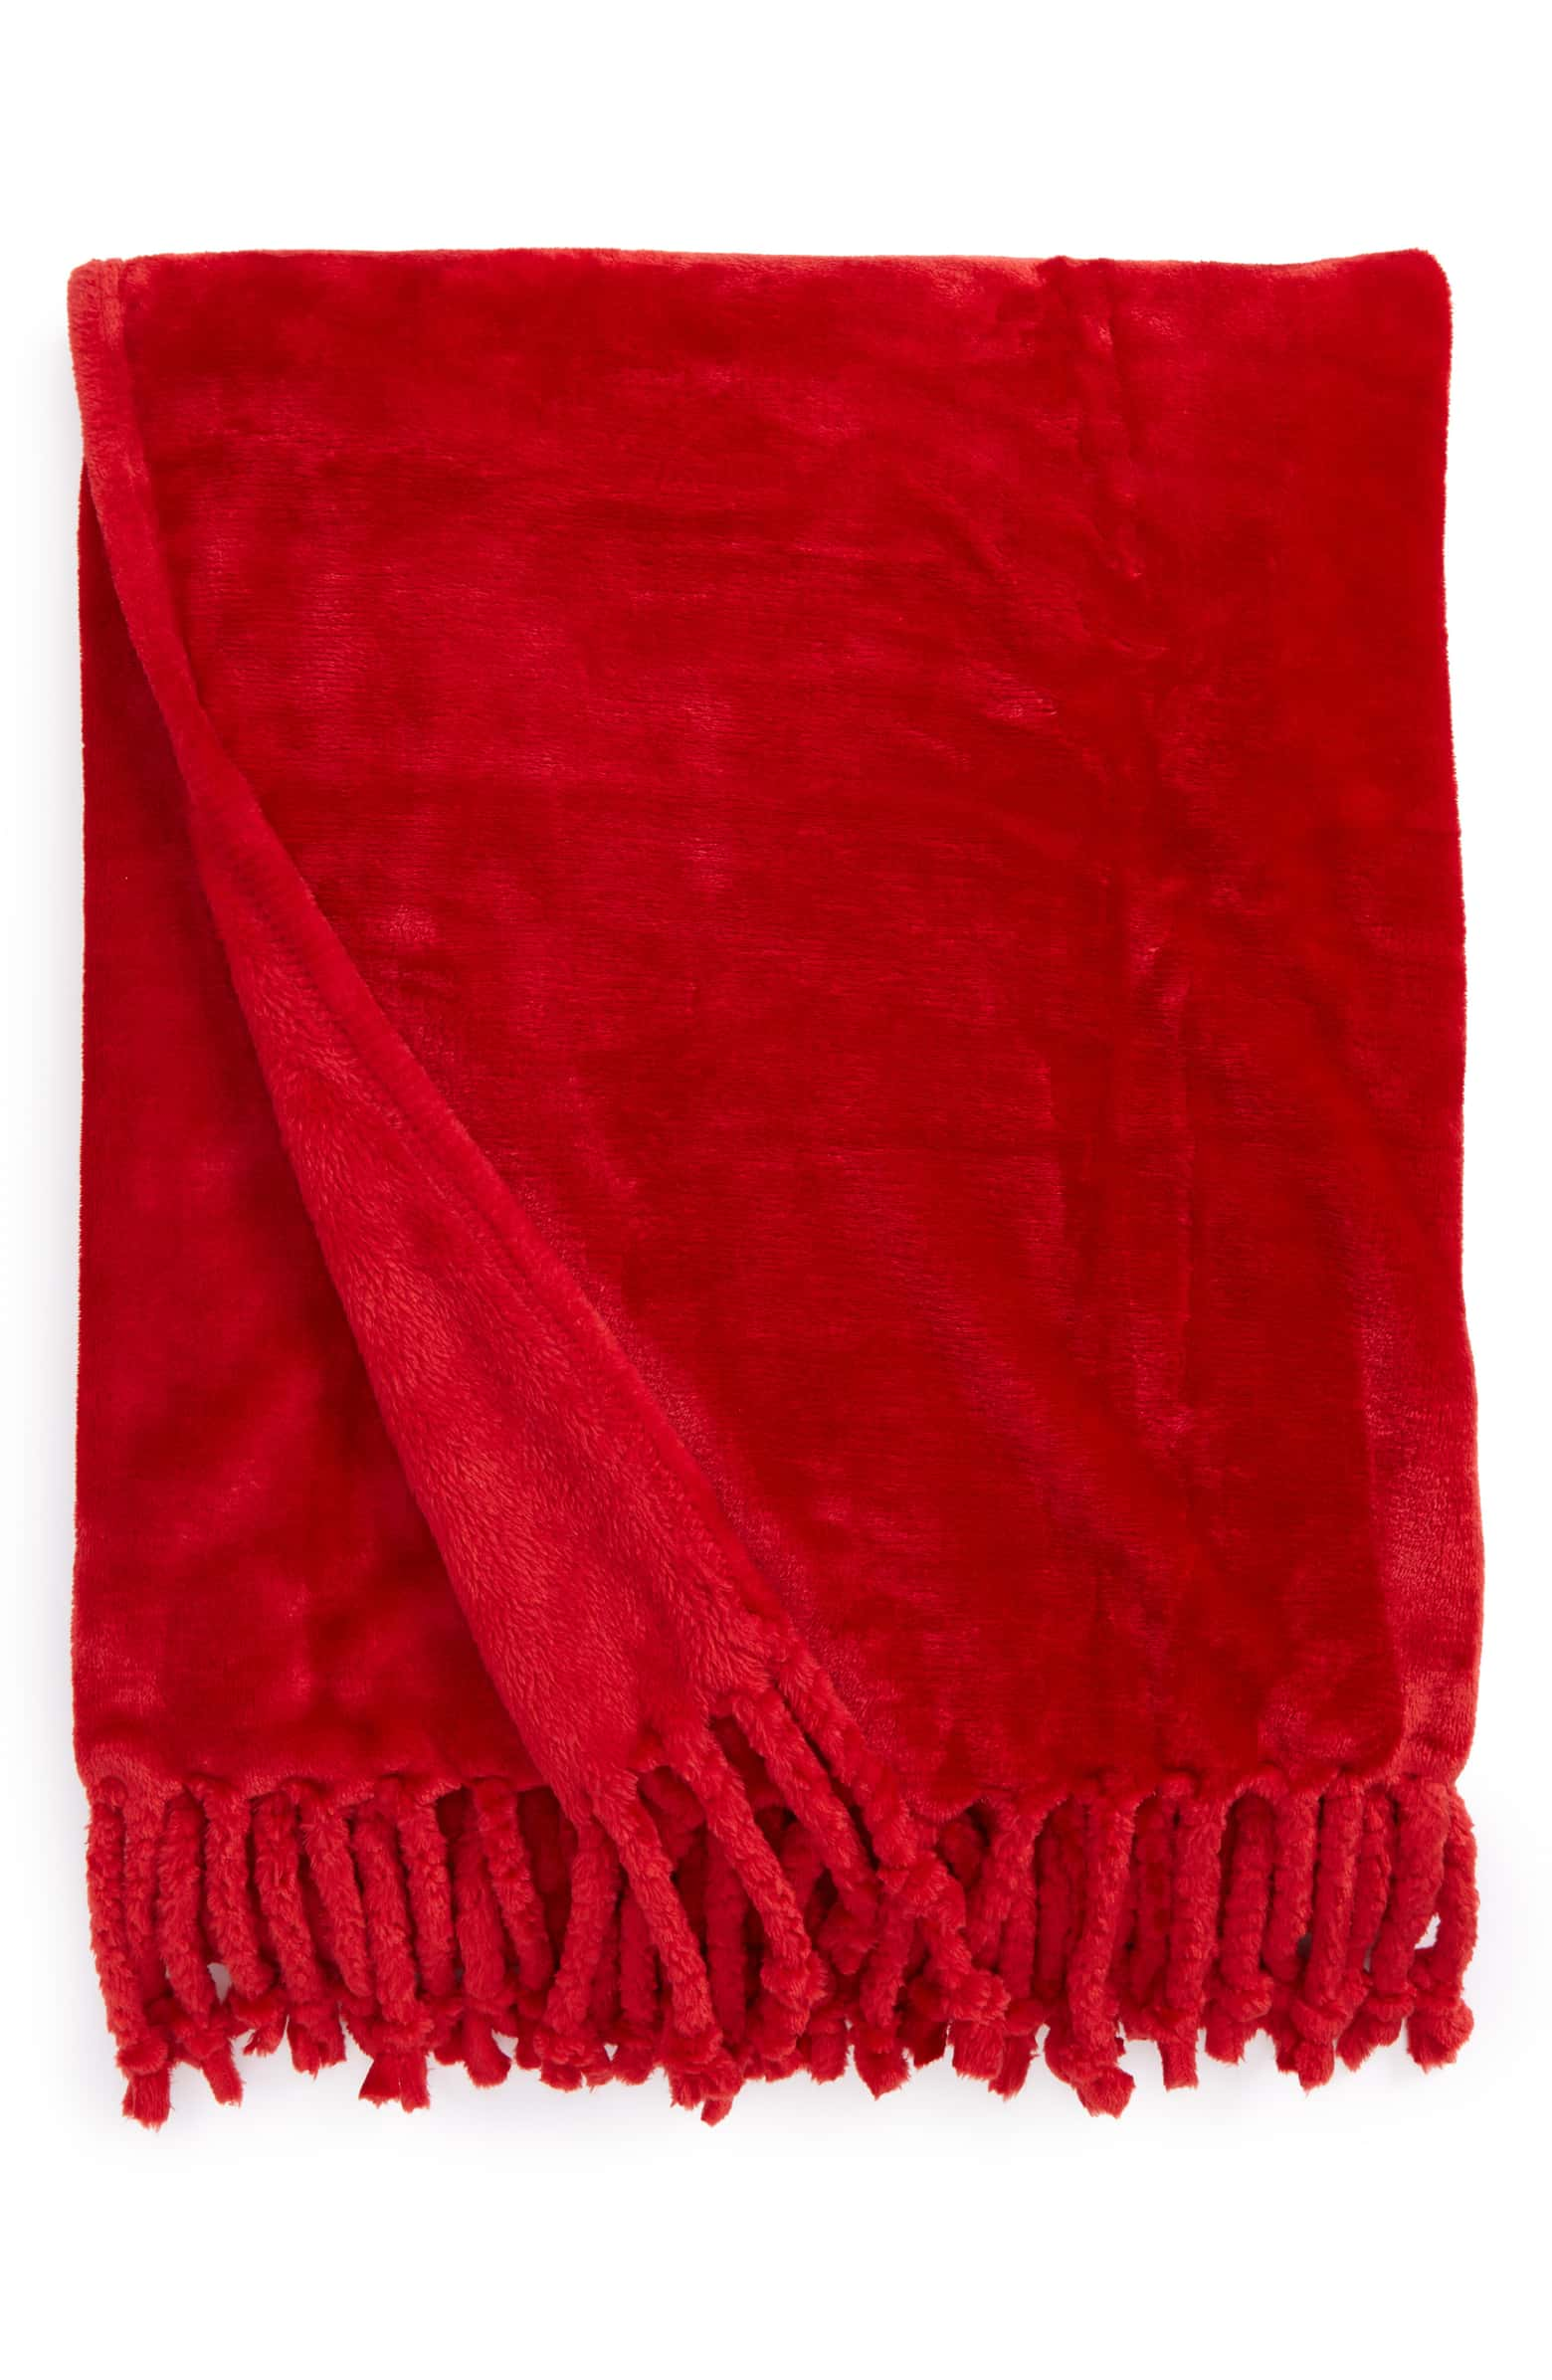 Cozy Blanket - $29 on Nordstrom